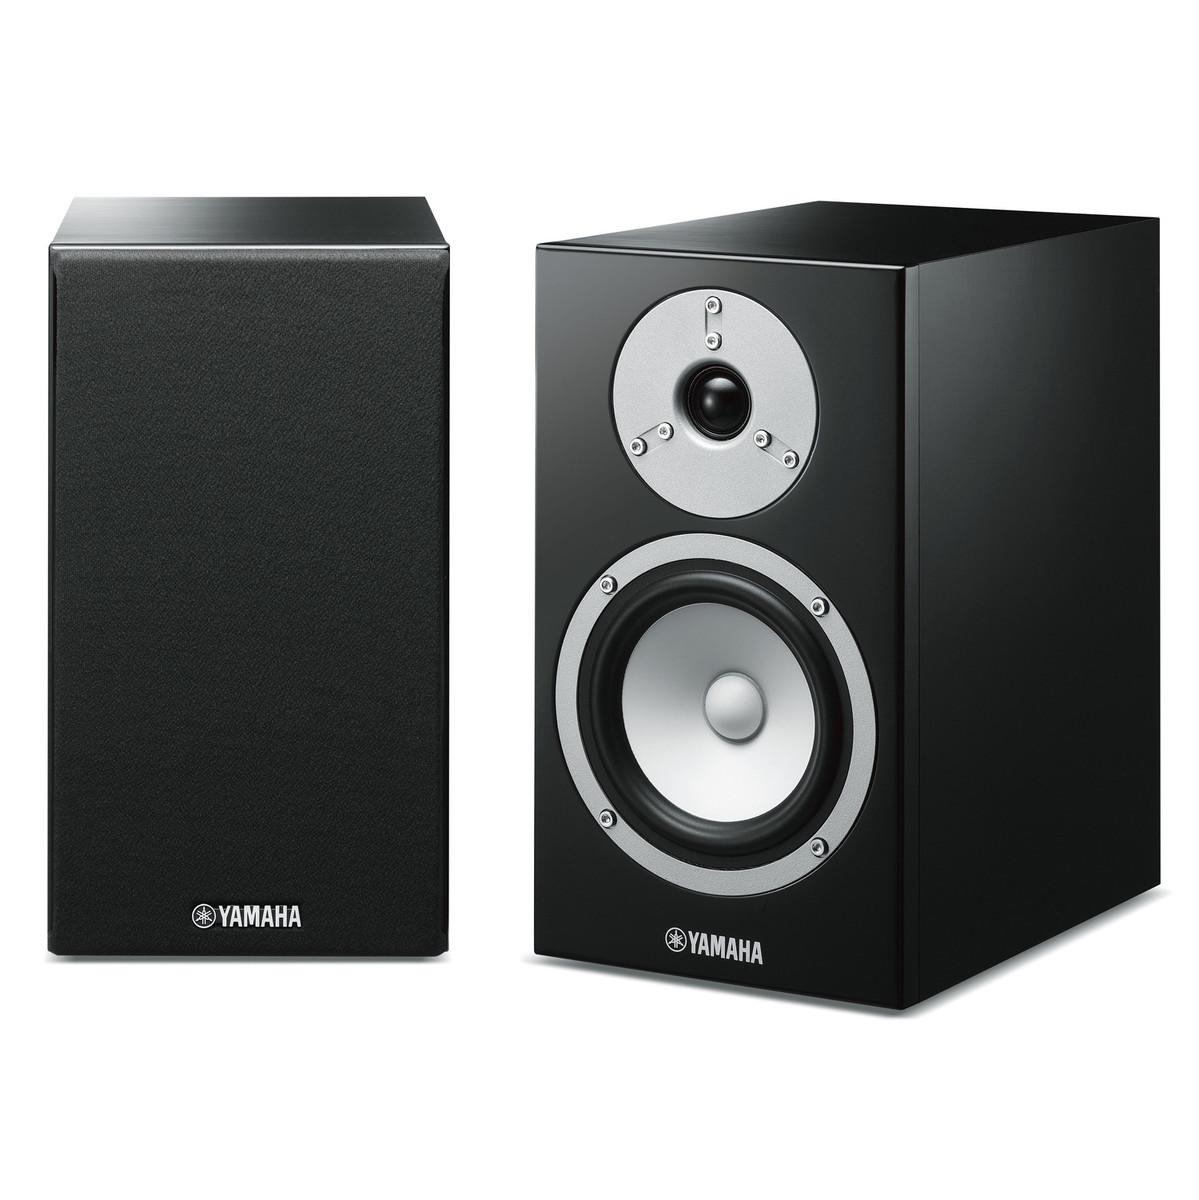 Yamaha nsbp301 hi fi speakers piano black at for Yamaha sound dock